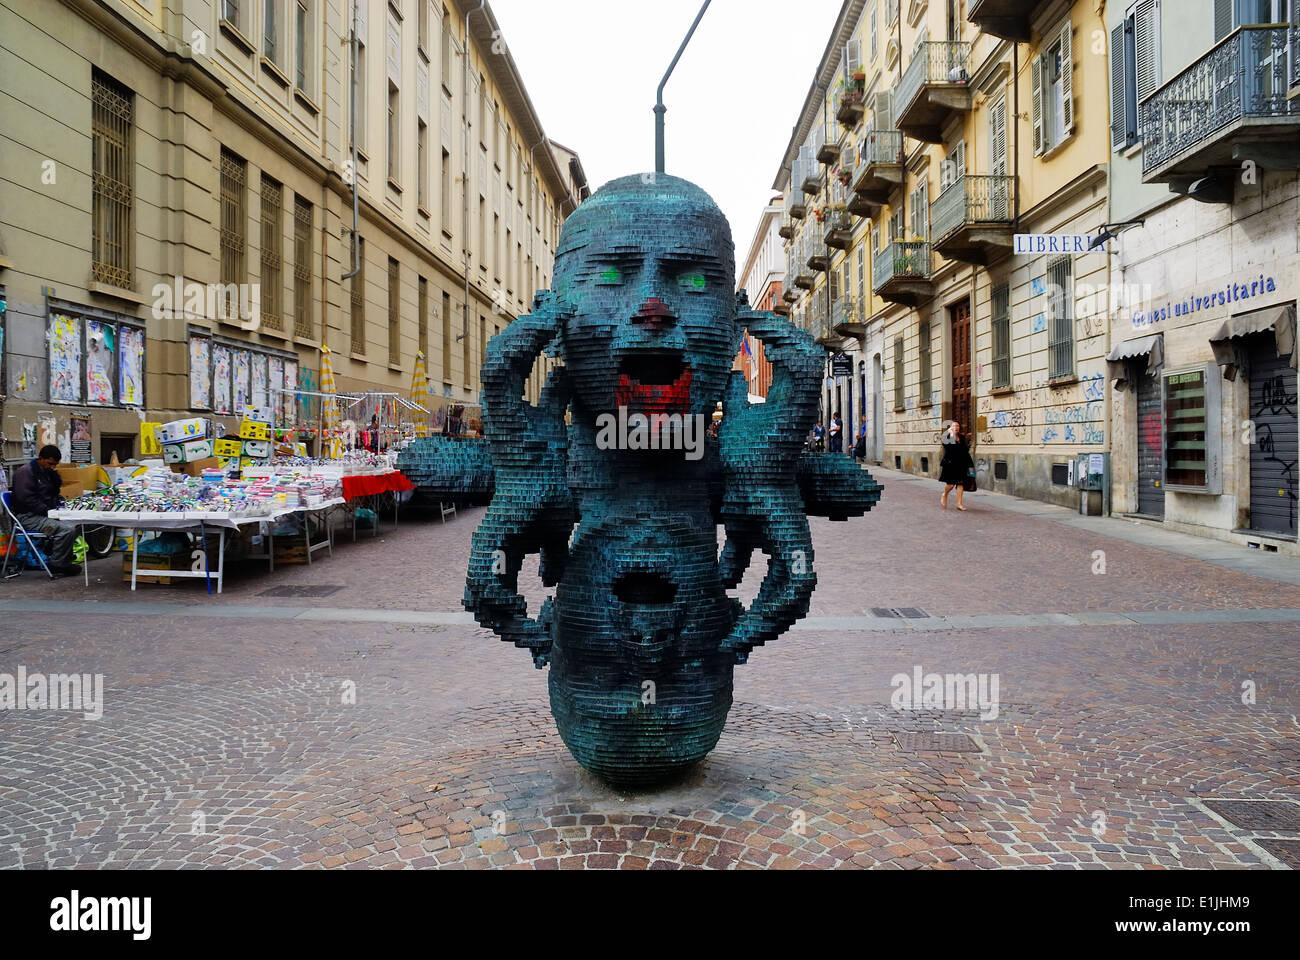 Turín, Giuseppe Verdi street. ' El reflejo aullido '. La gran escultura de bronce del artista Marc Breton Didou. Foto de stock